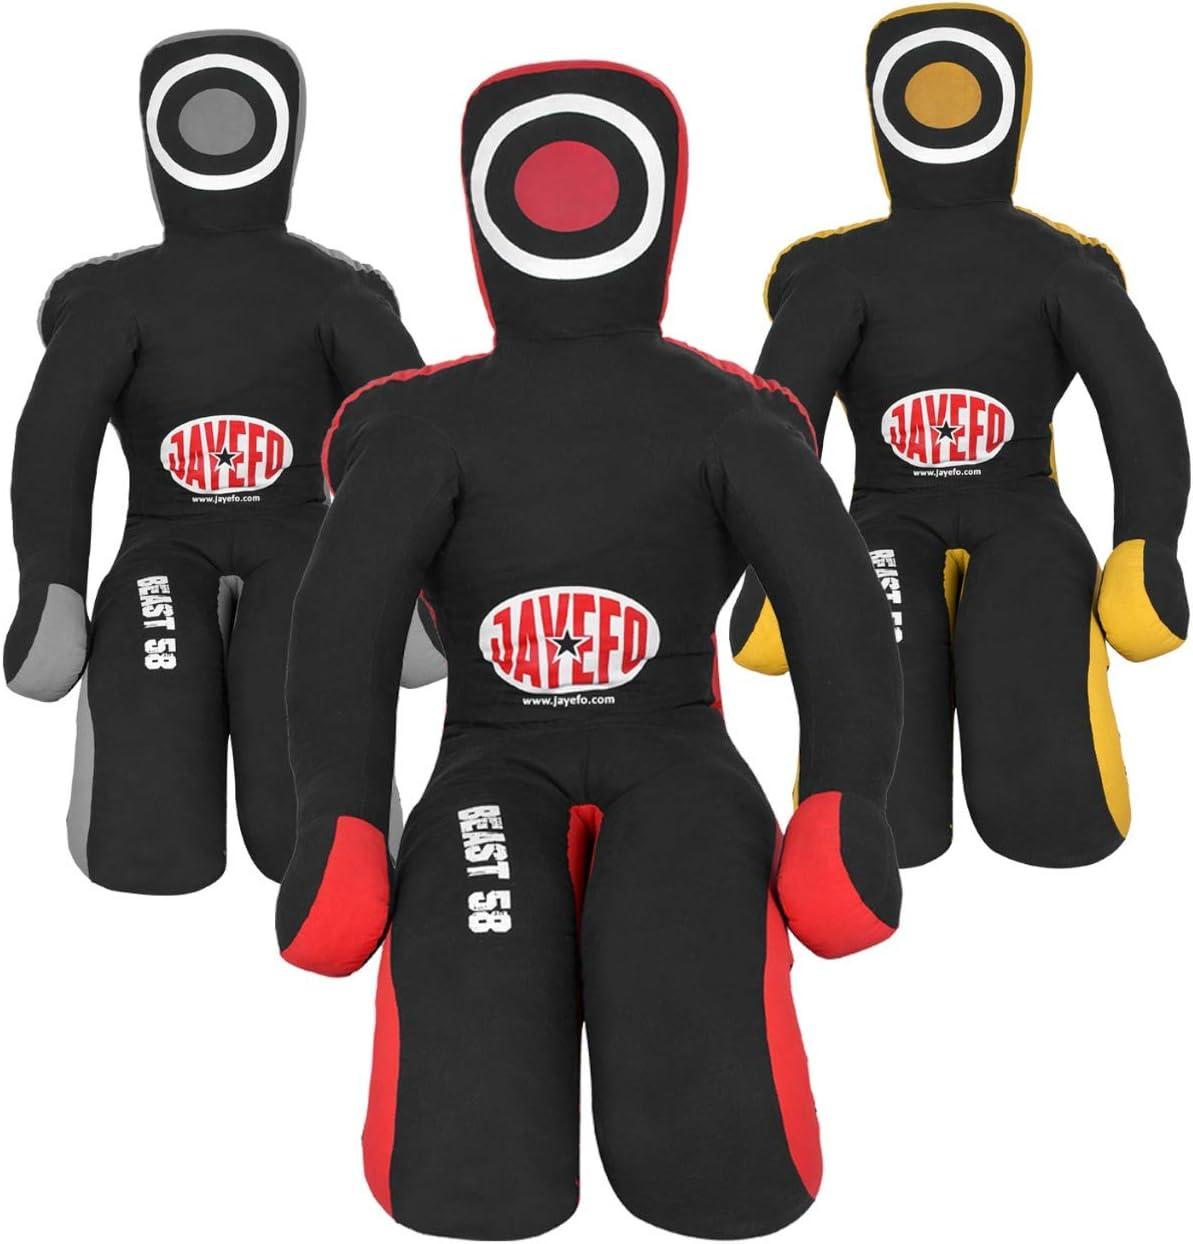 Jayefo Beast 58 BJJ Our shop OFFers the best service Brazilian JIU Wrestling for Jitsu Sacramento Mall Grap Dummy